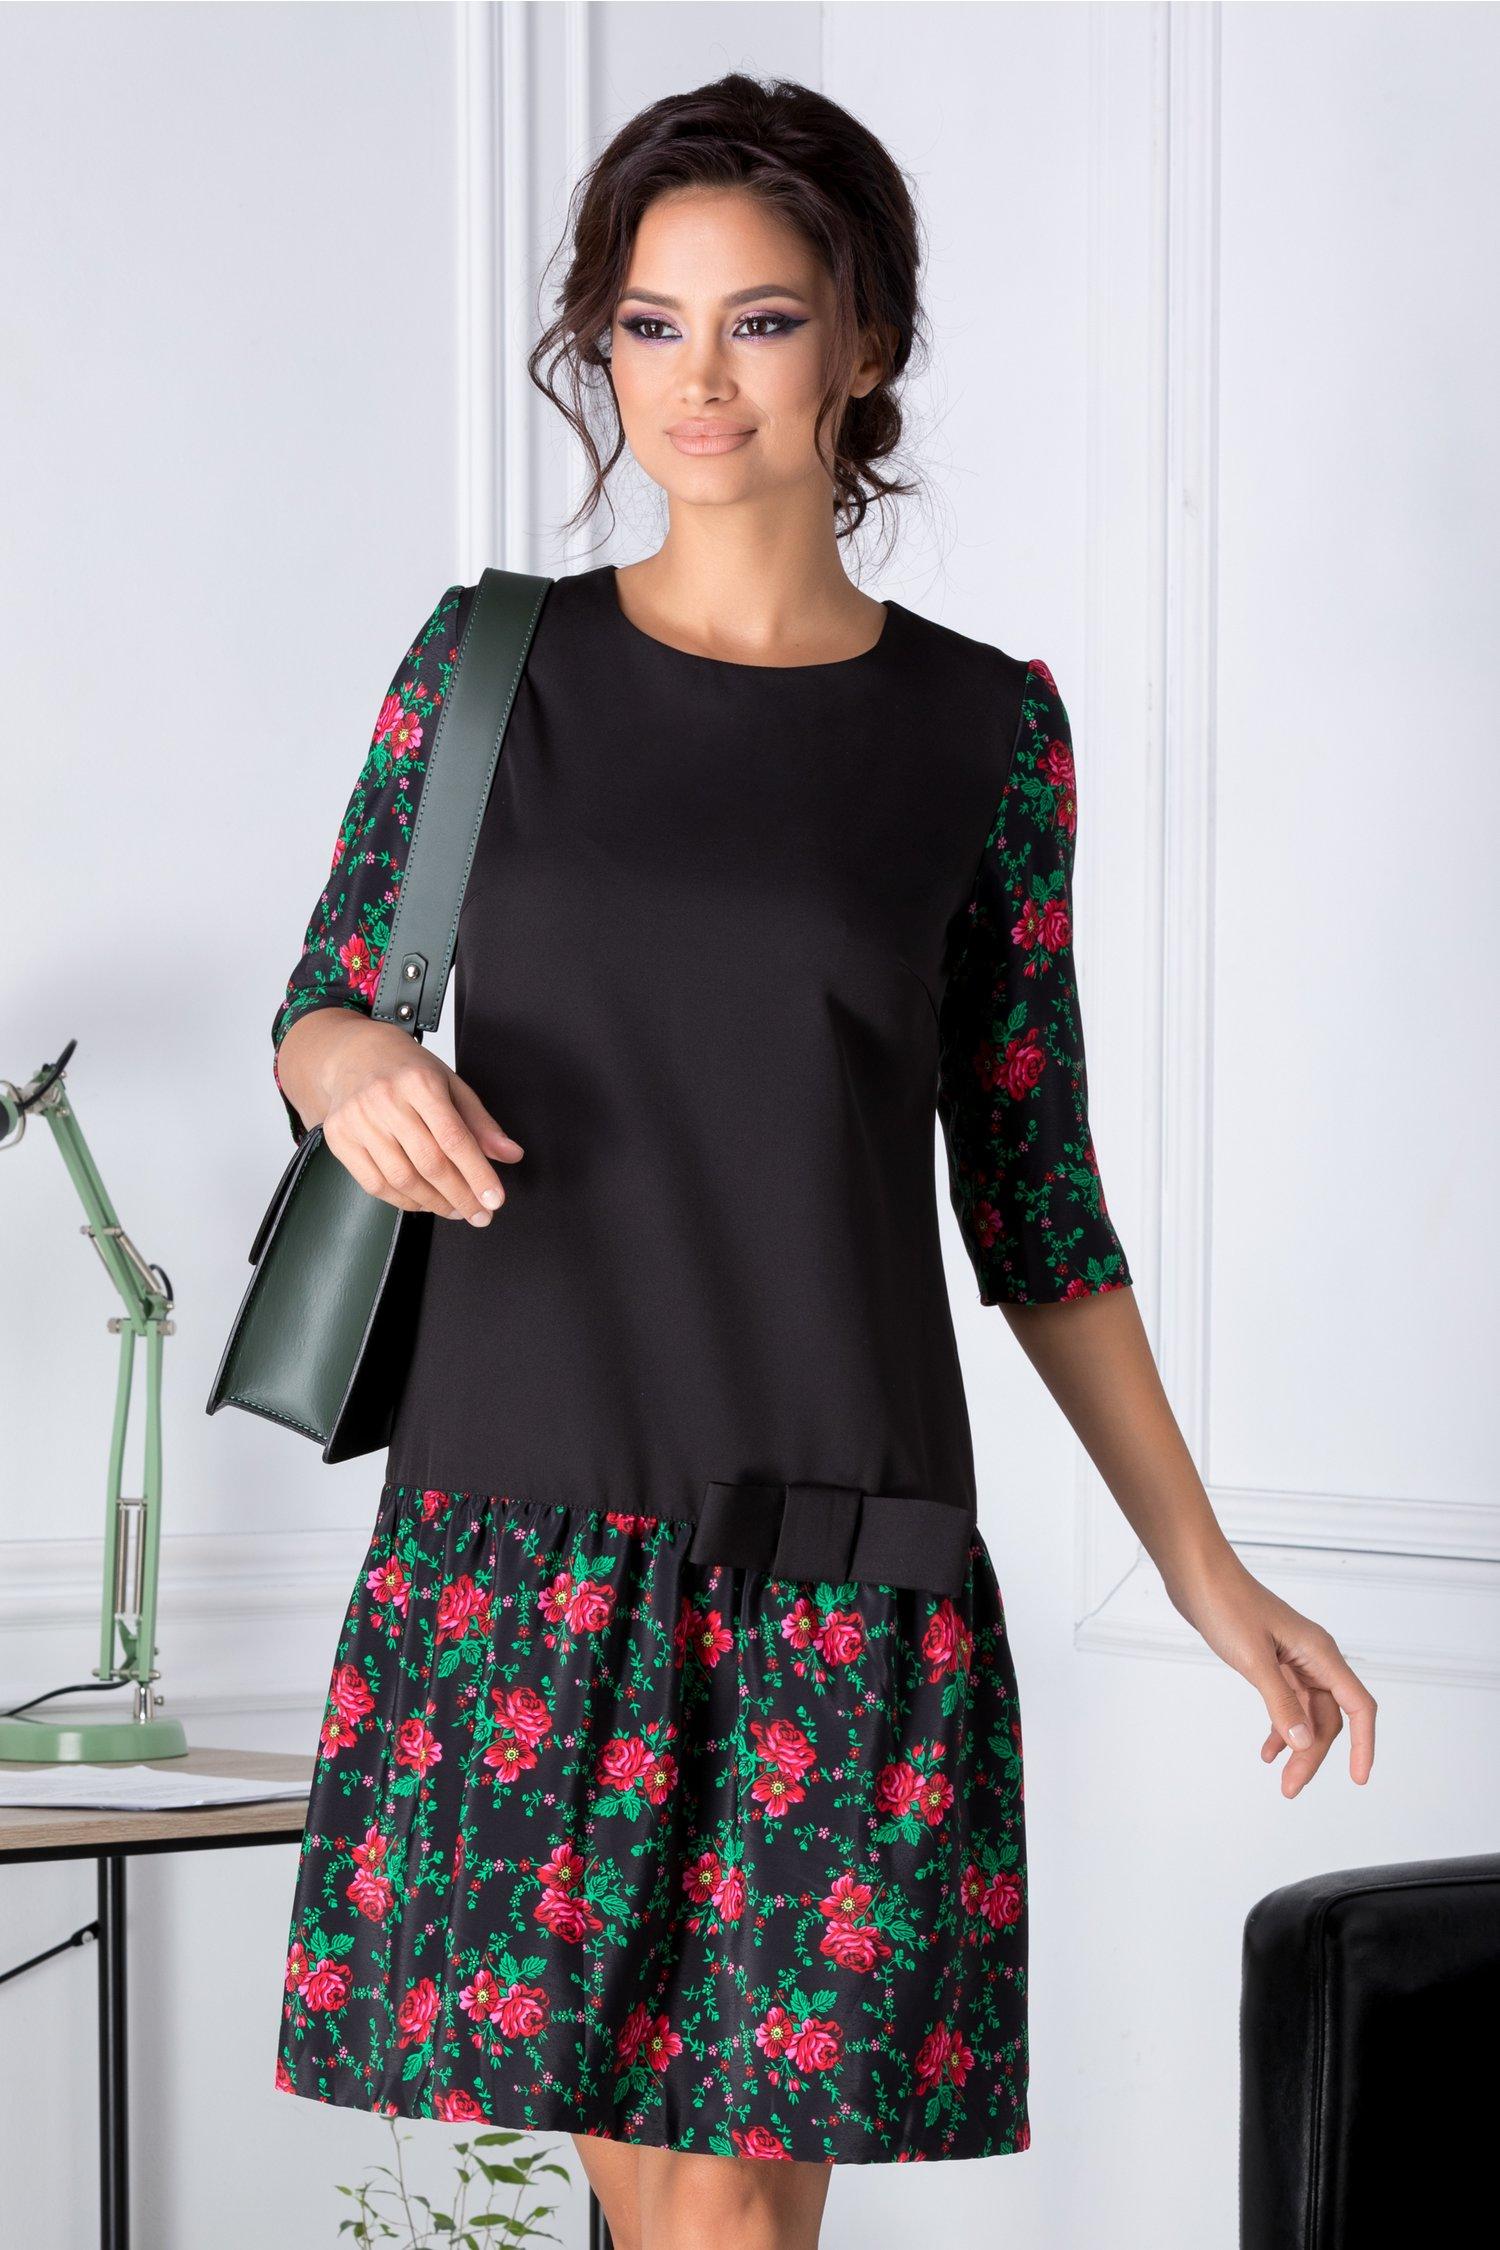 Rochie Ely neagra cu imprimeuri florale